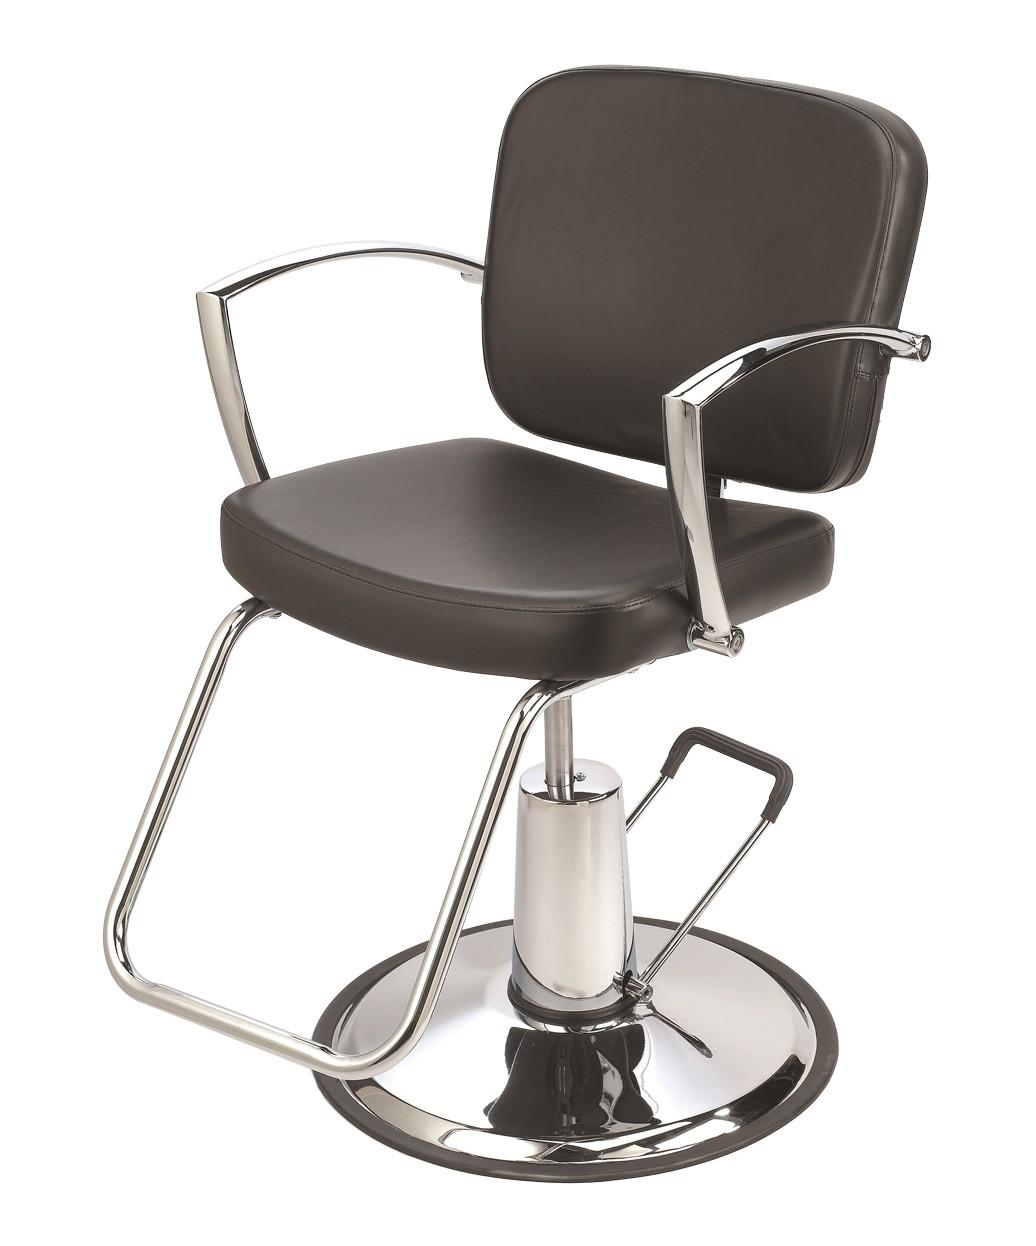 Pibbs 3706 Pisa Styling Chair